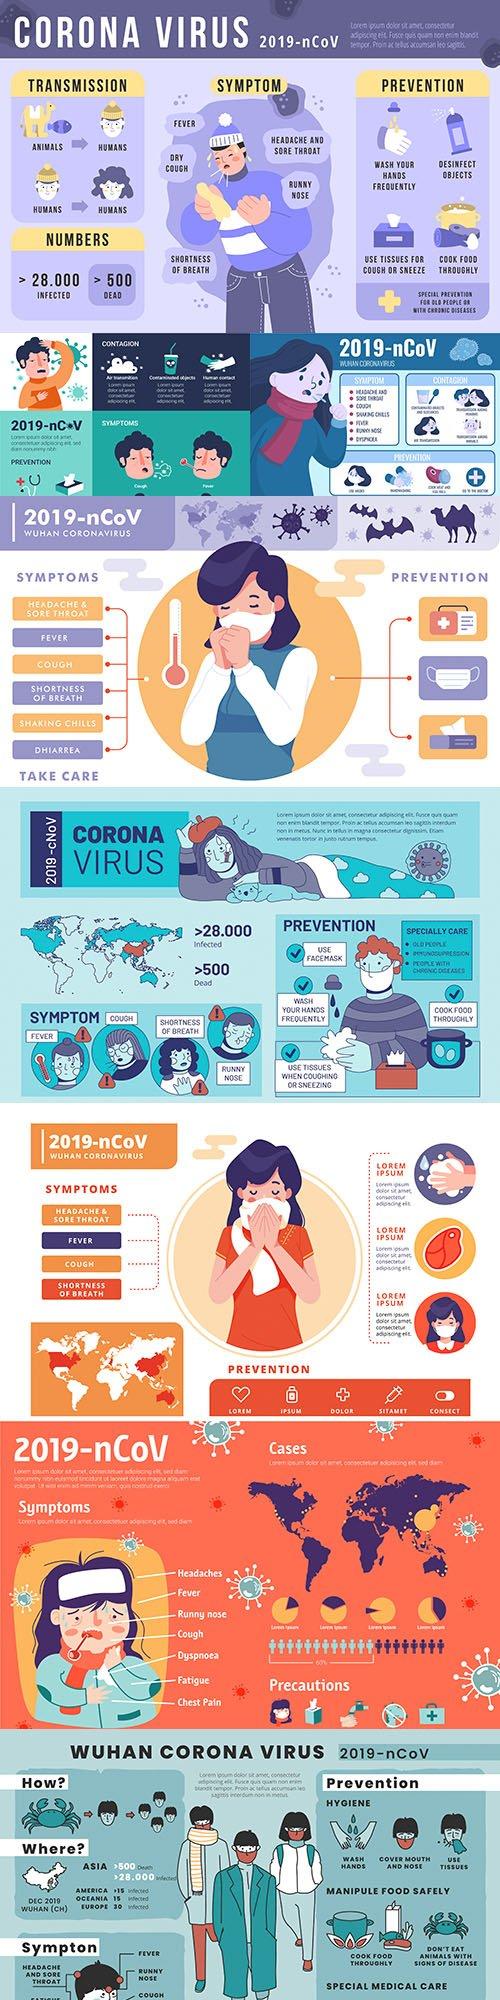 Coronavirus 2019 symptoms and infographic infection